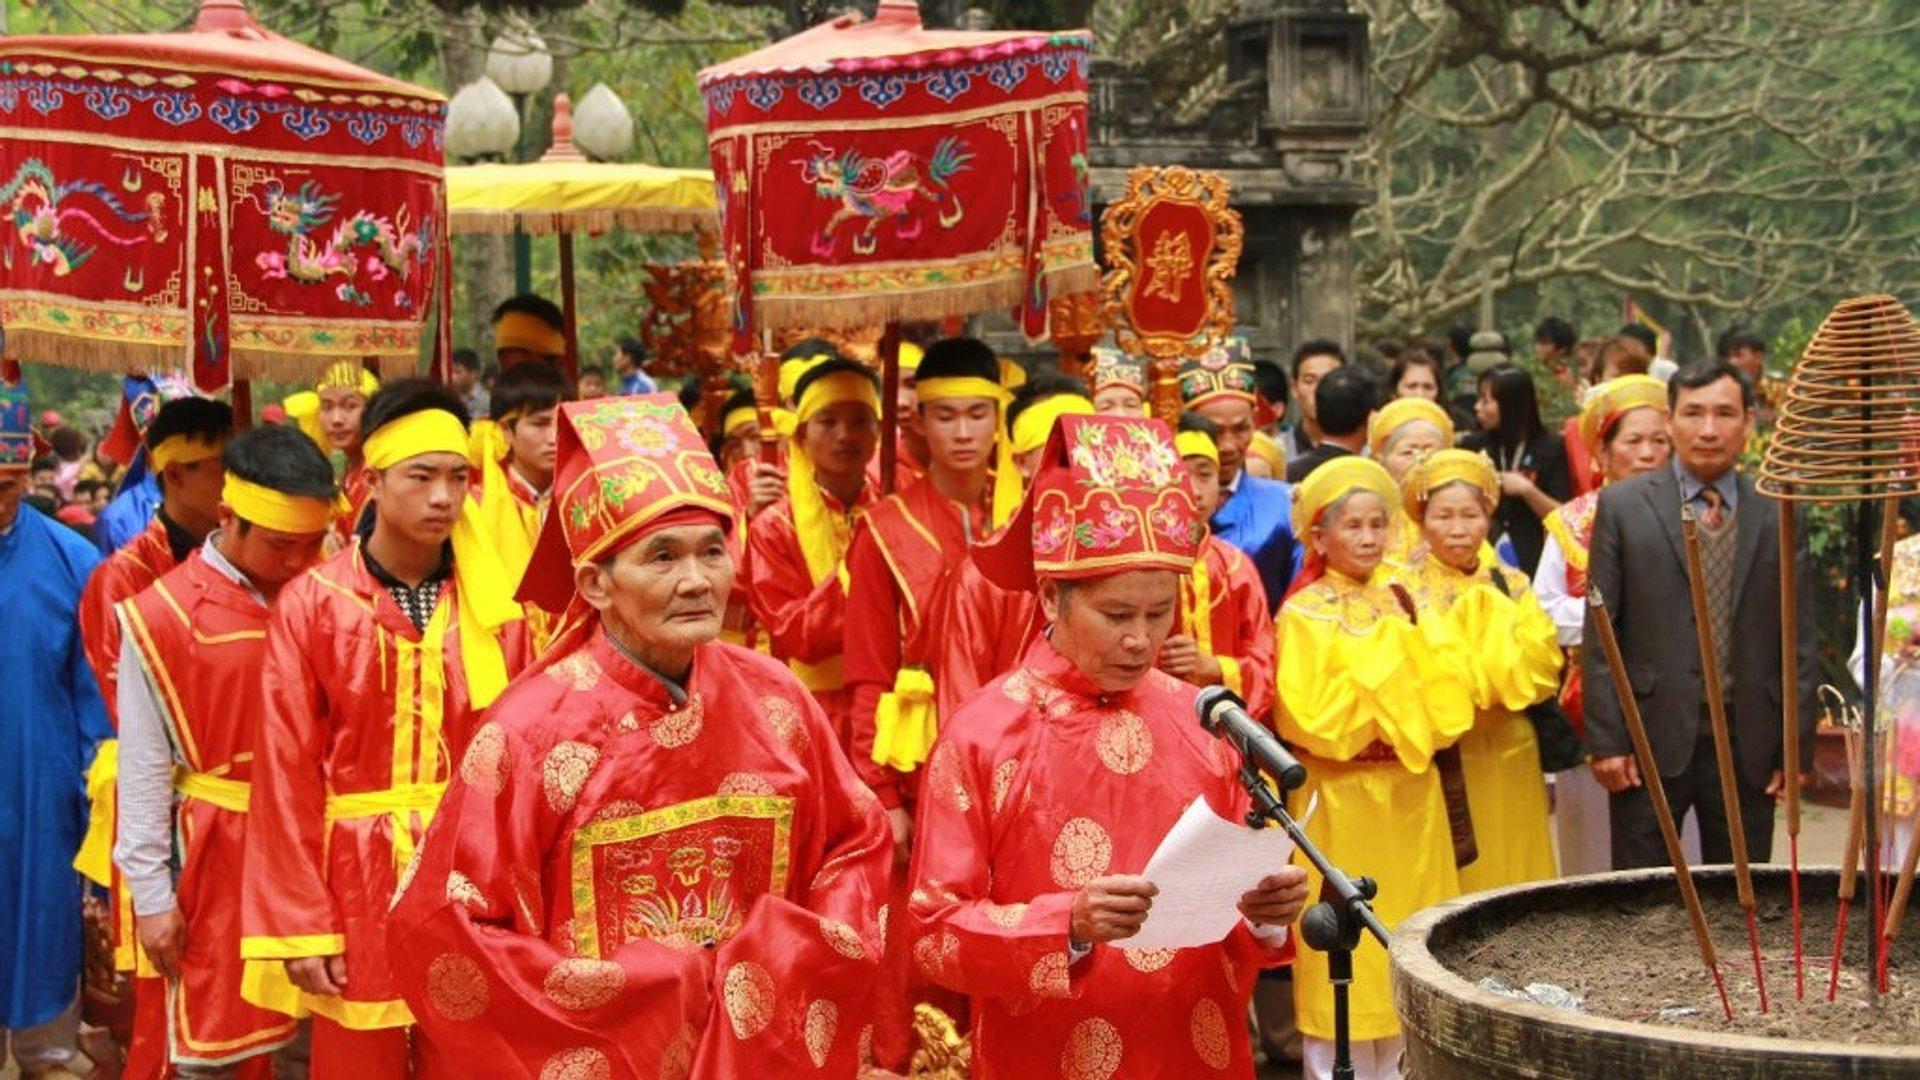 Giong Festival in Vietnam - Best Time